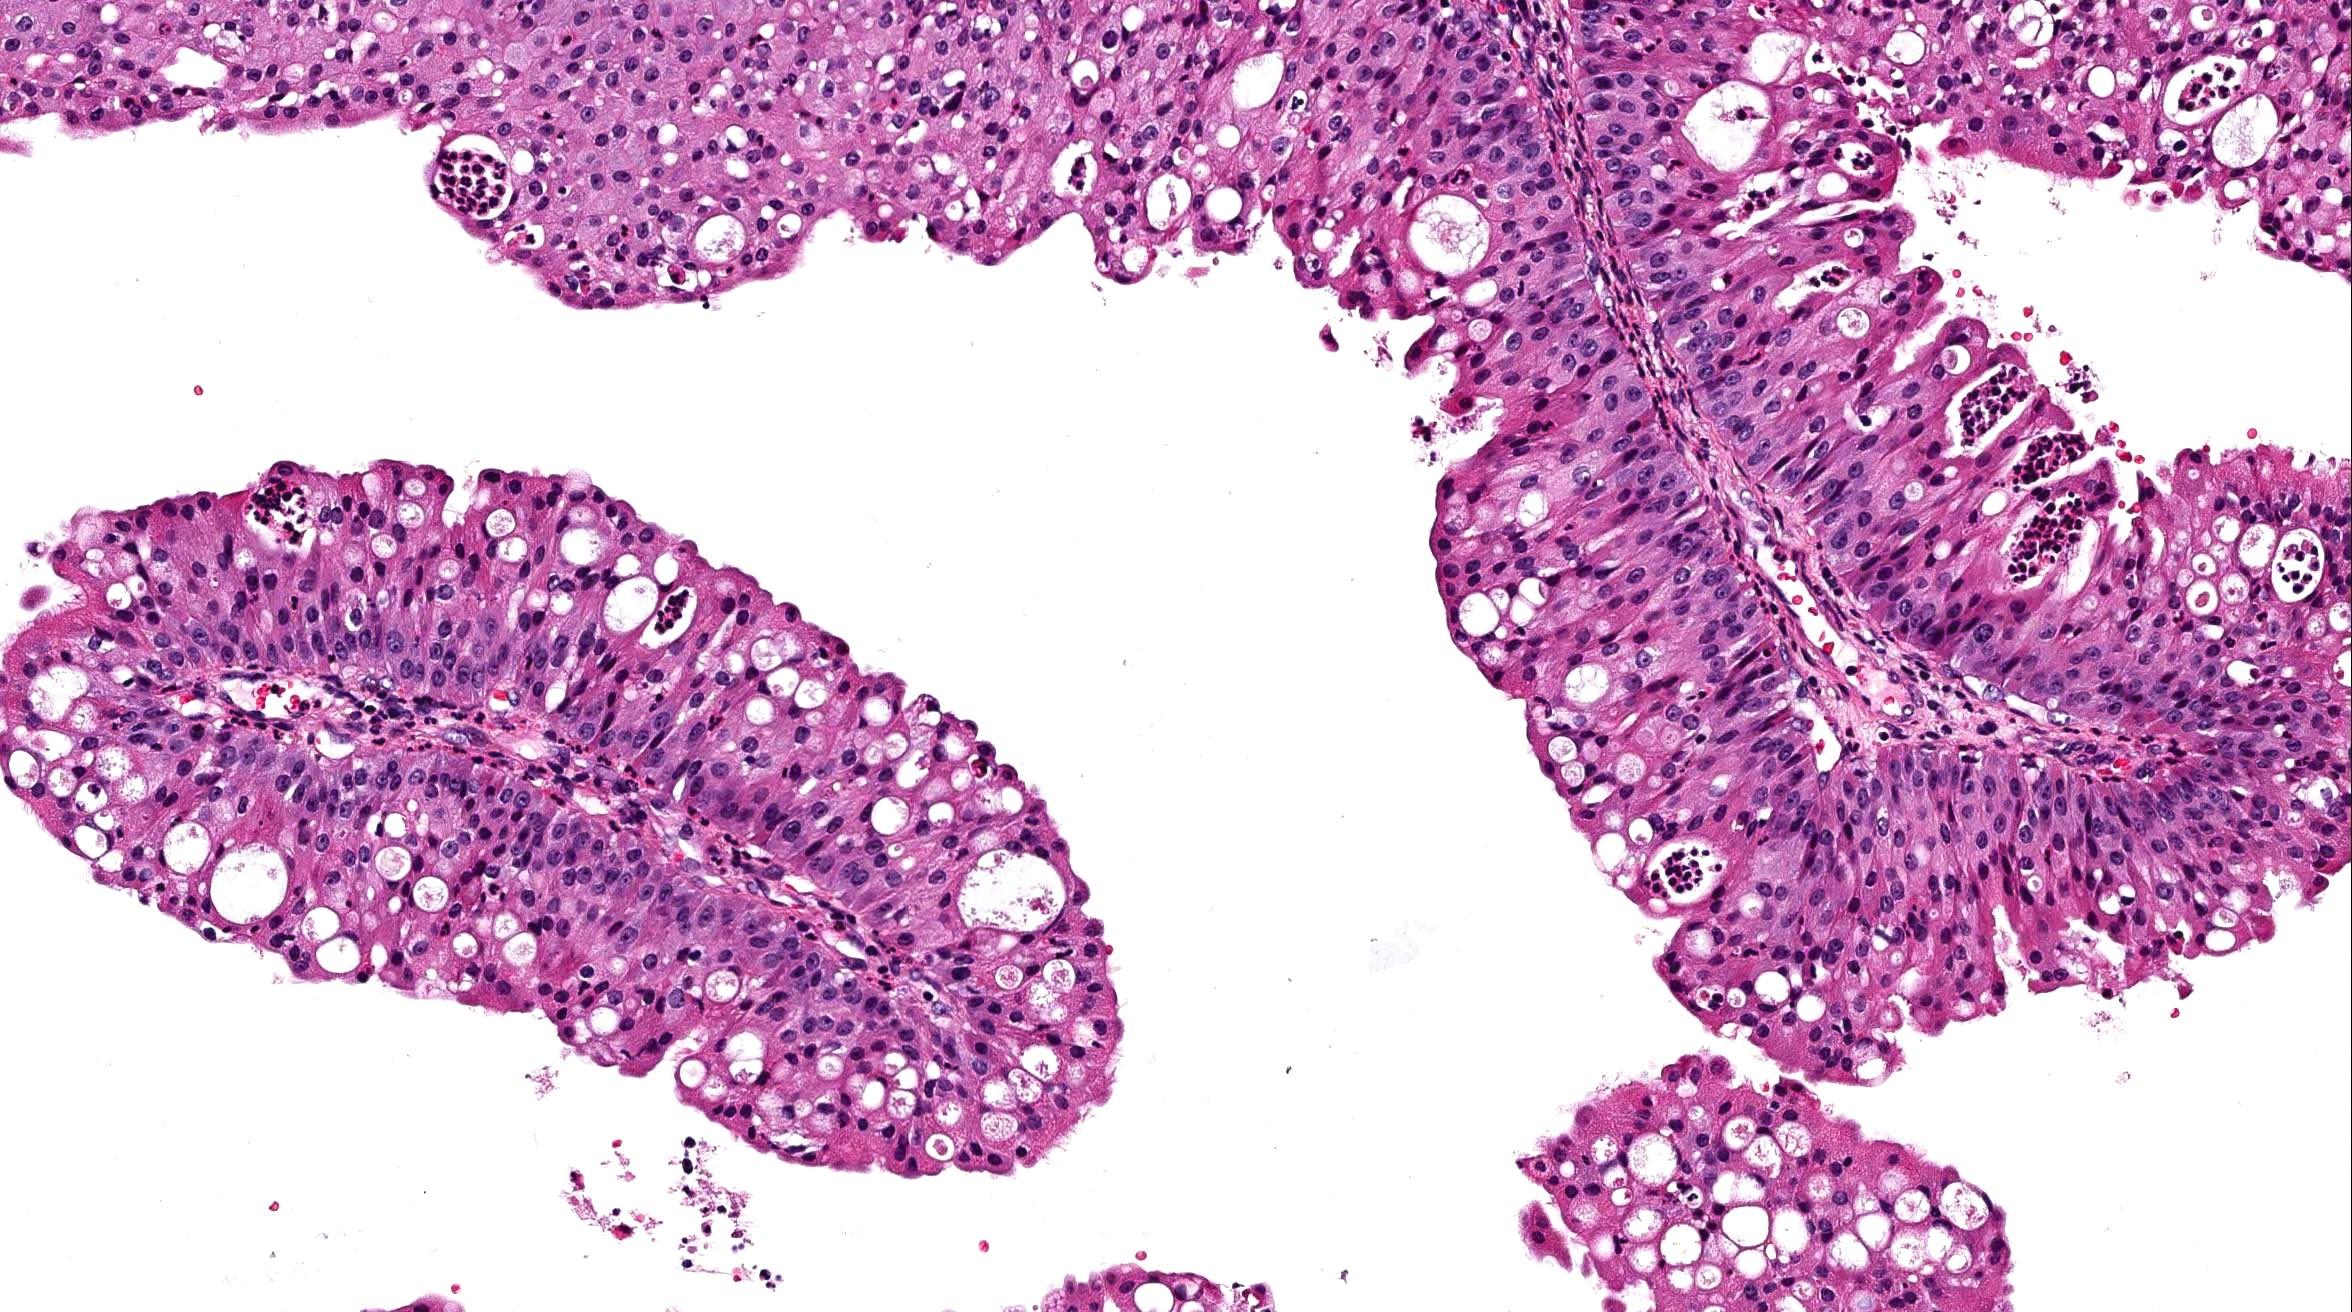 schneiderian papilloma with dysplasia